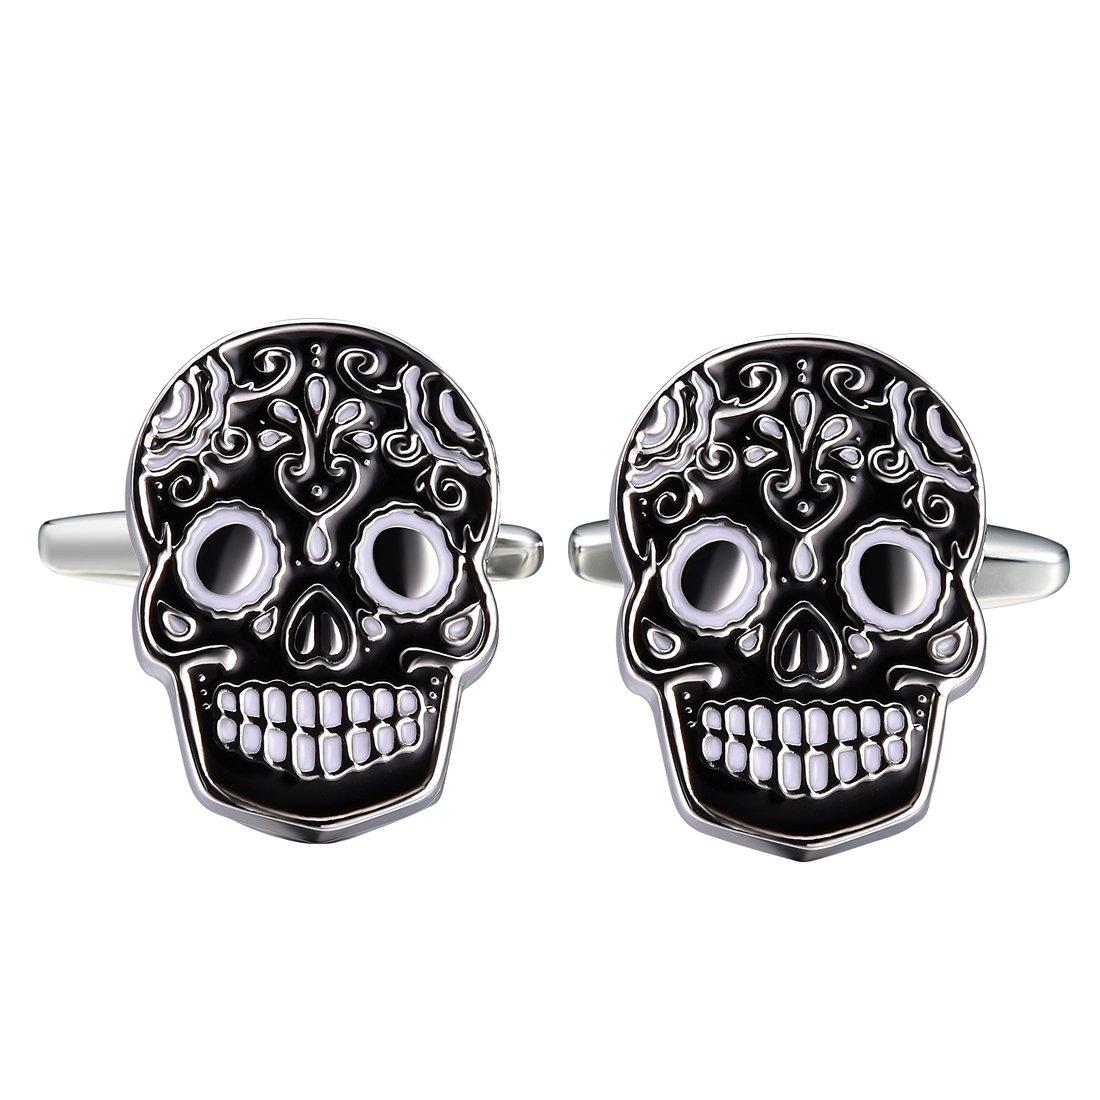 Three Keys Jewelry Stainless steel Black Brass Men's Skull Cufflinks